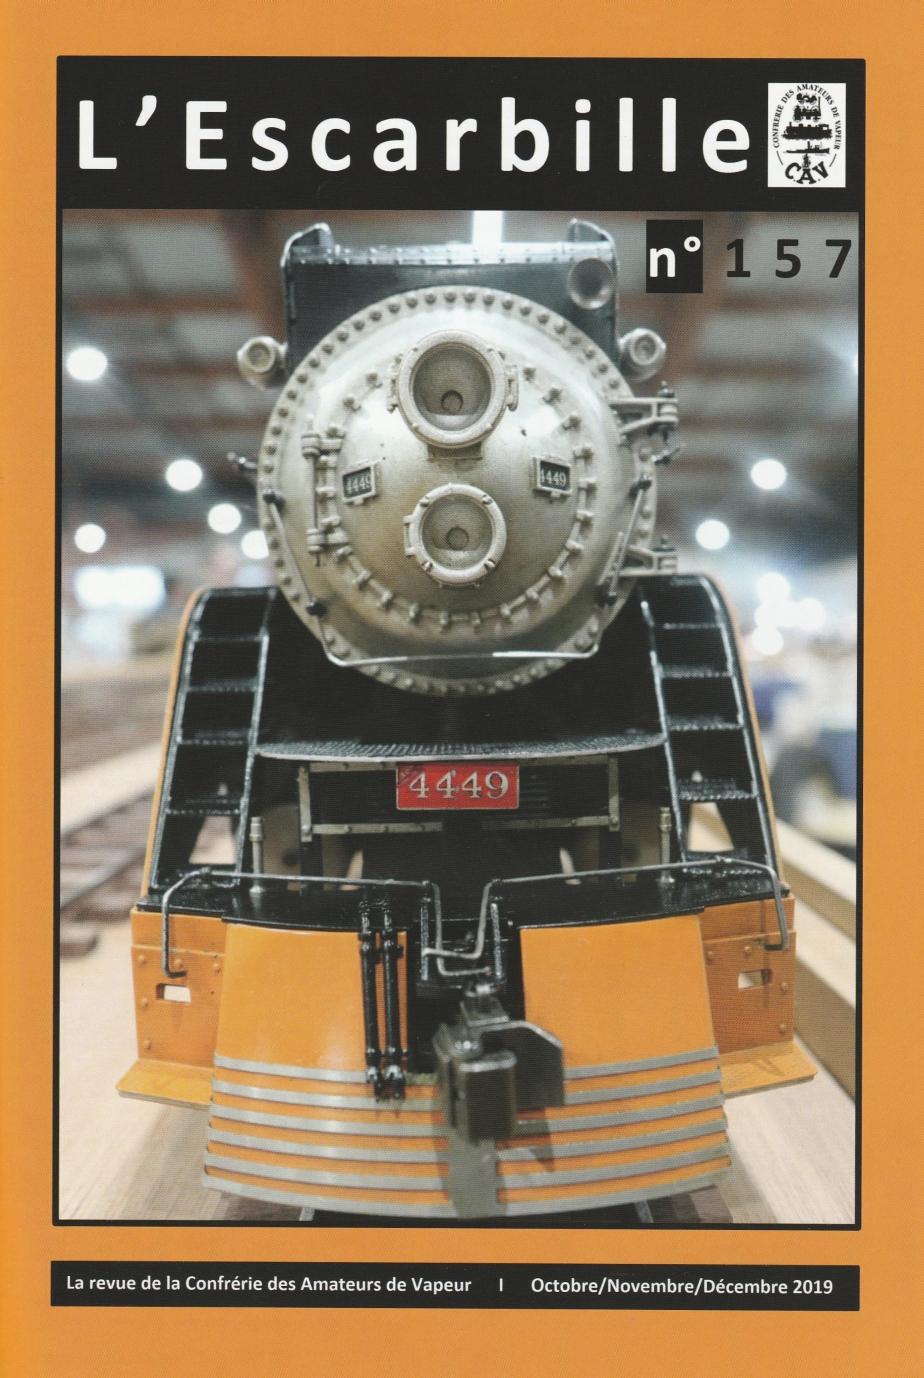 *** El Tren de Vallparadís, a la revista l'Escarbille.